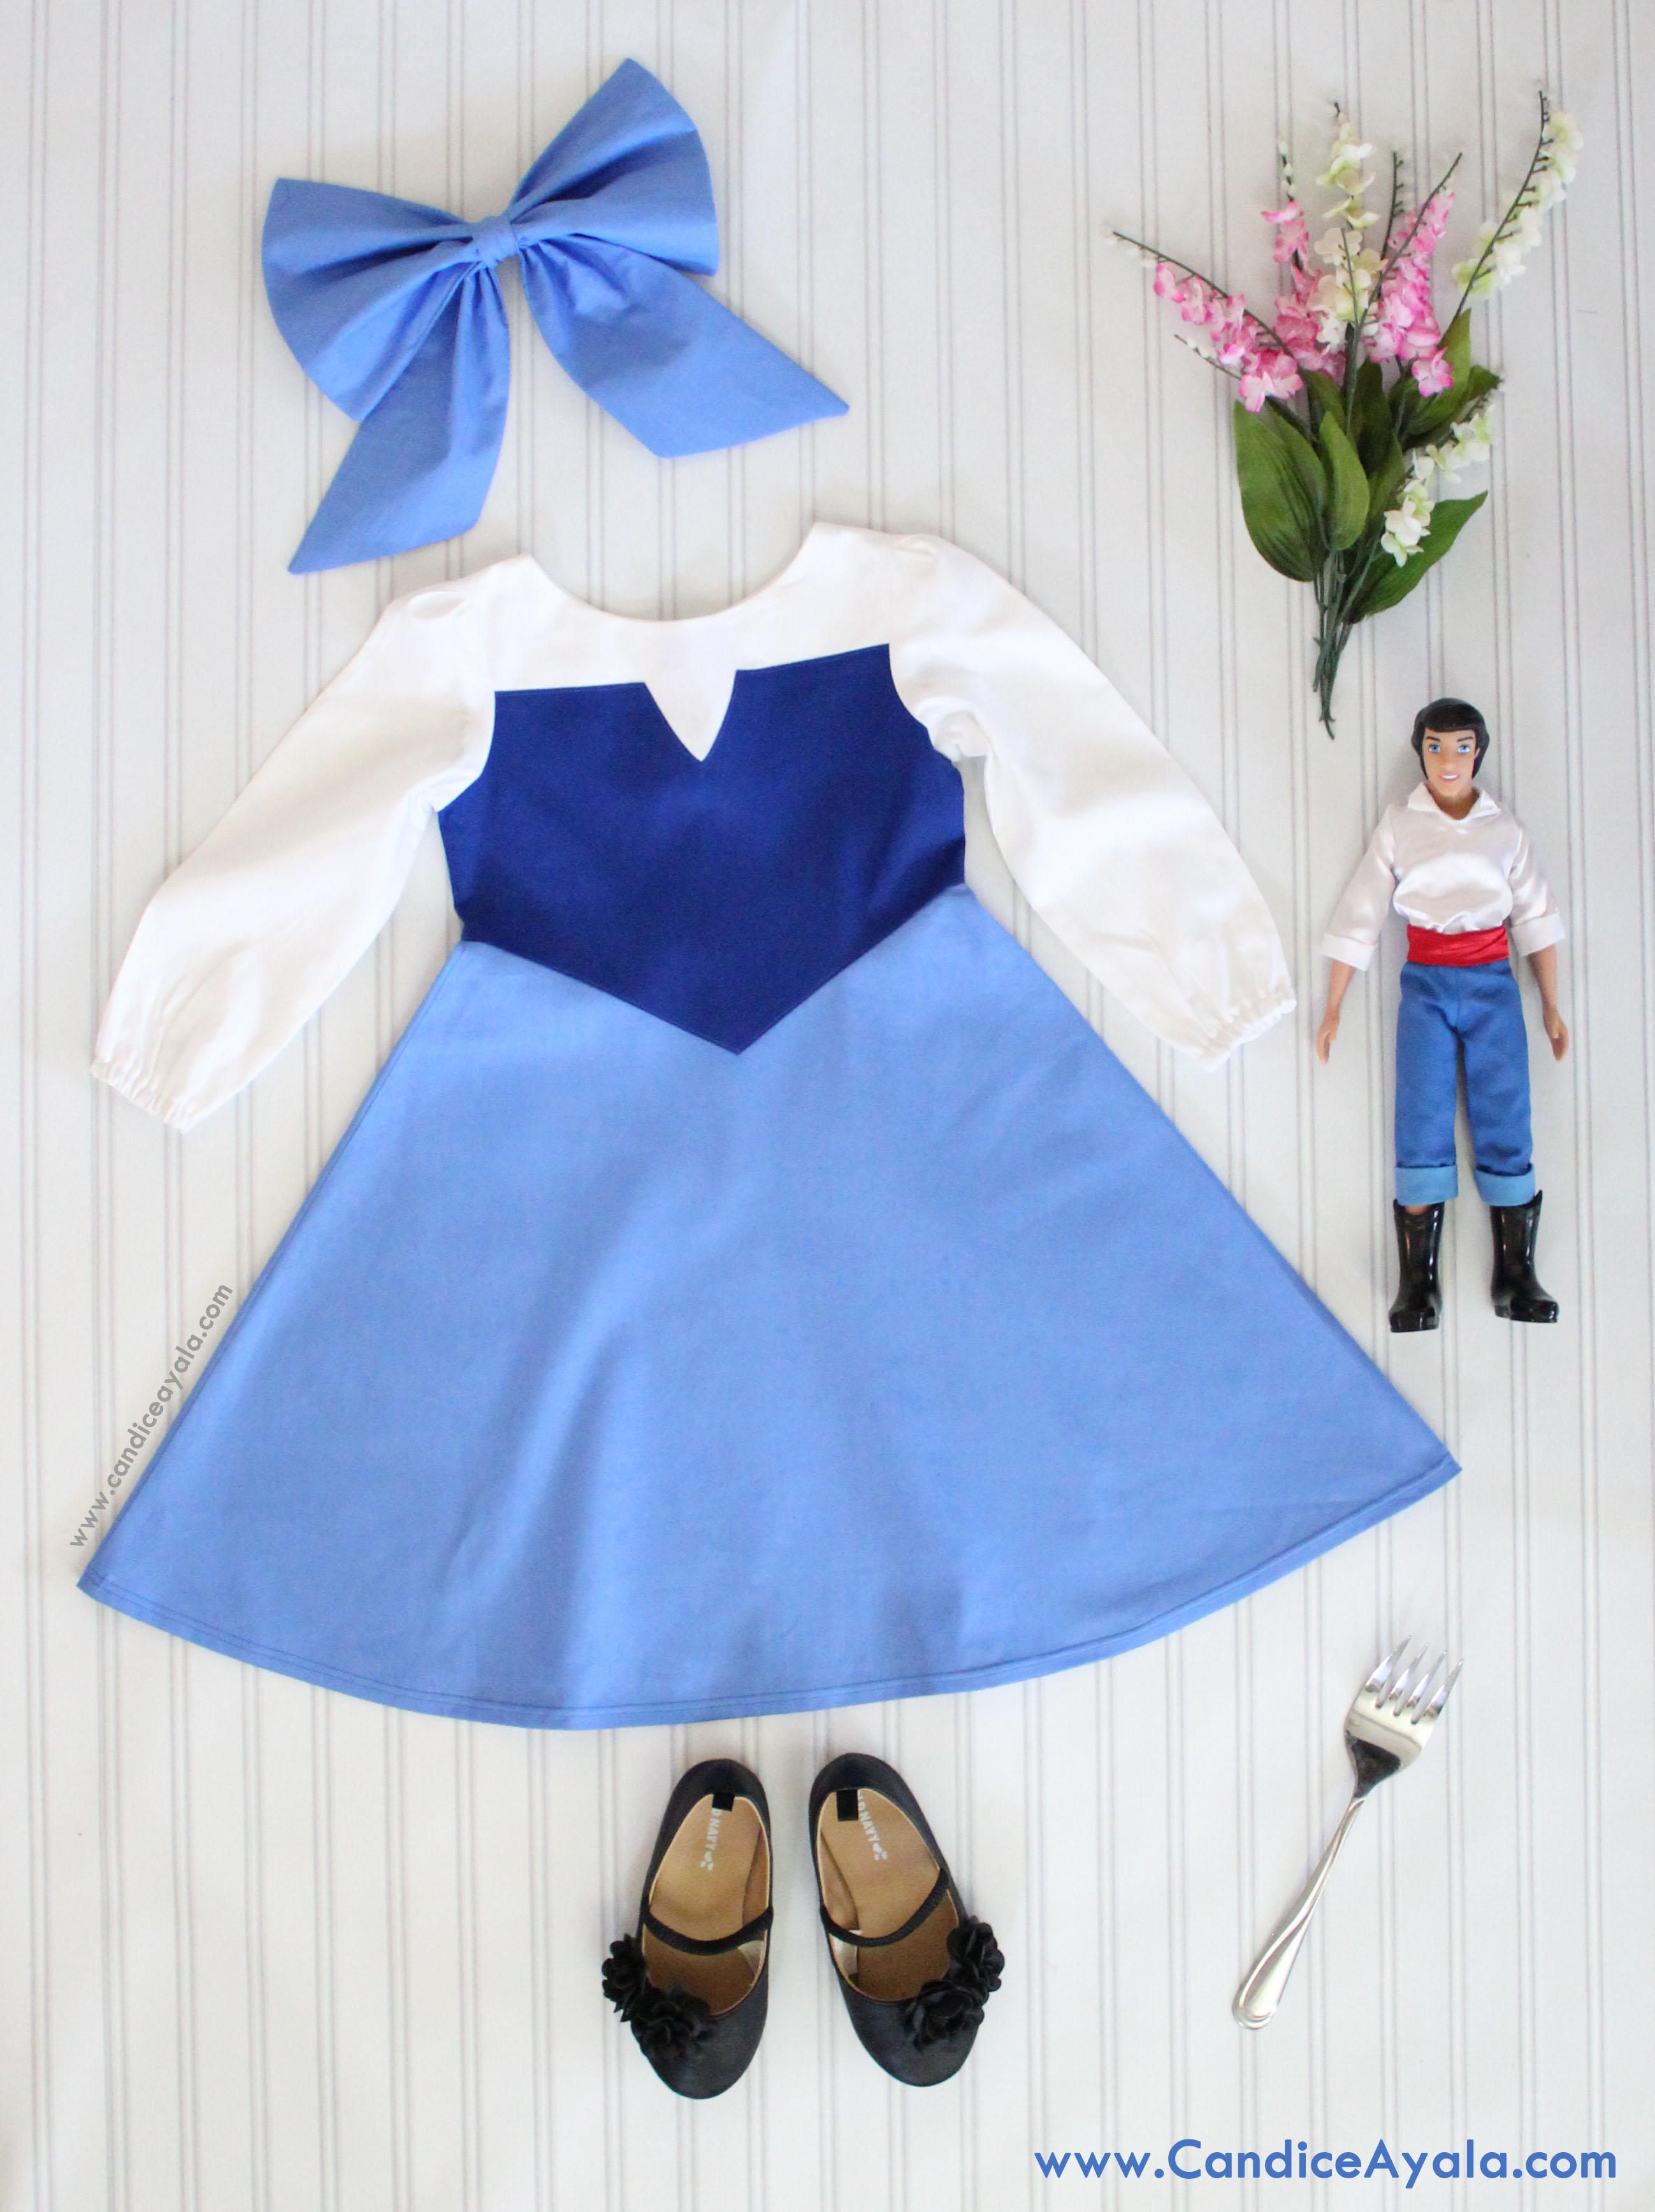 Diy ariels blue dress candice ayala arielbluedress solutioingenieria Image collections